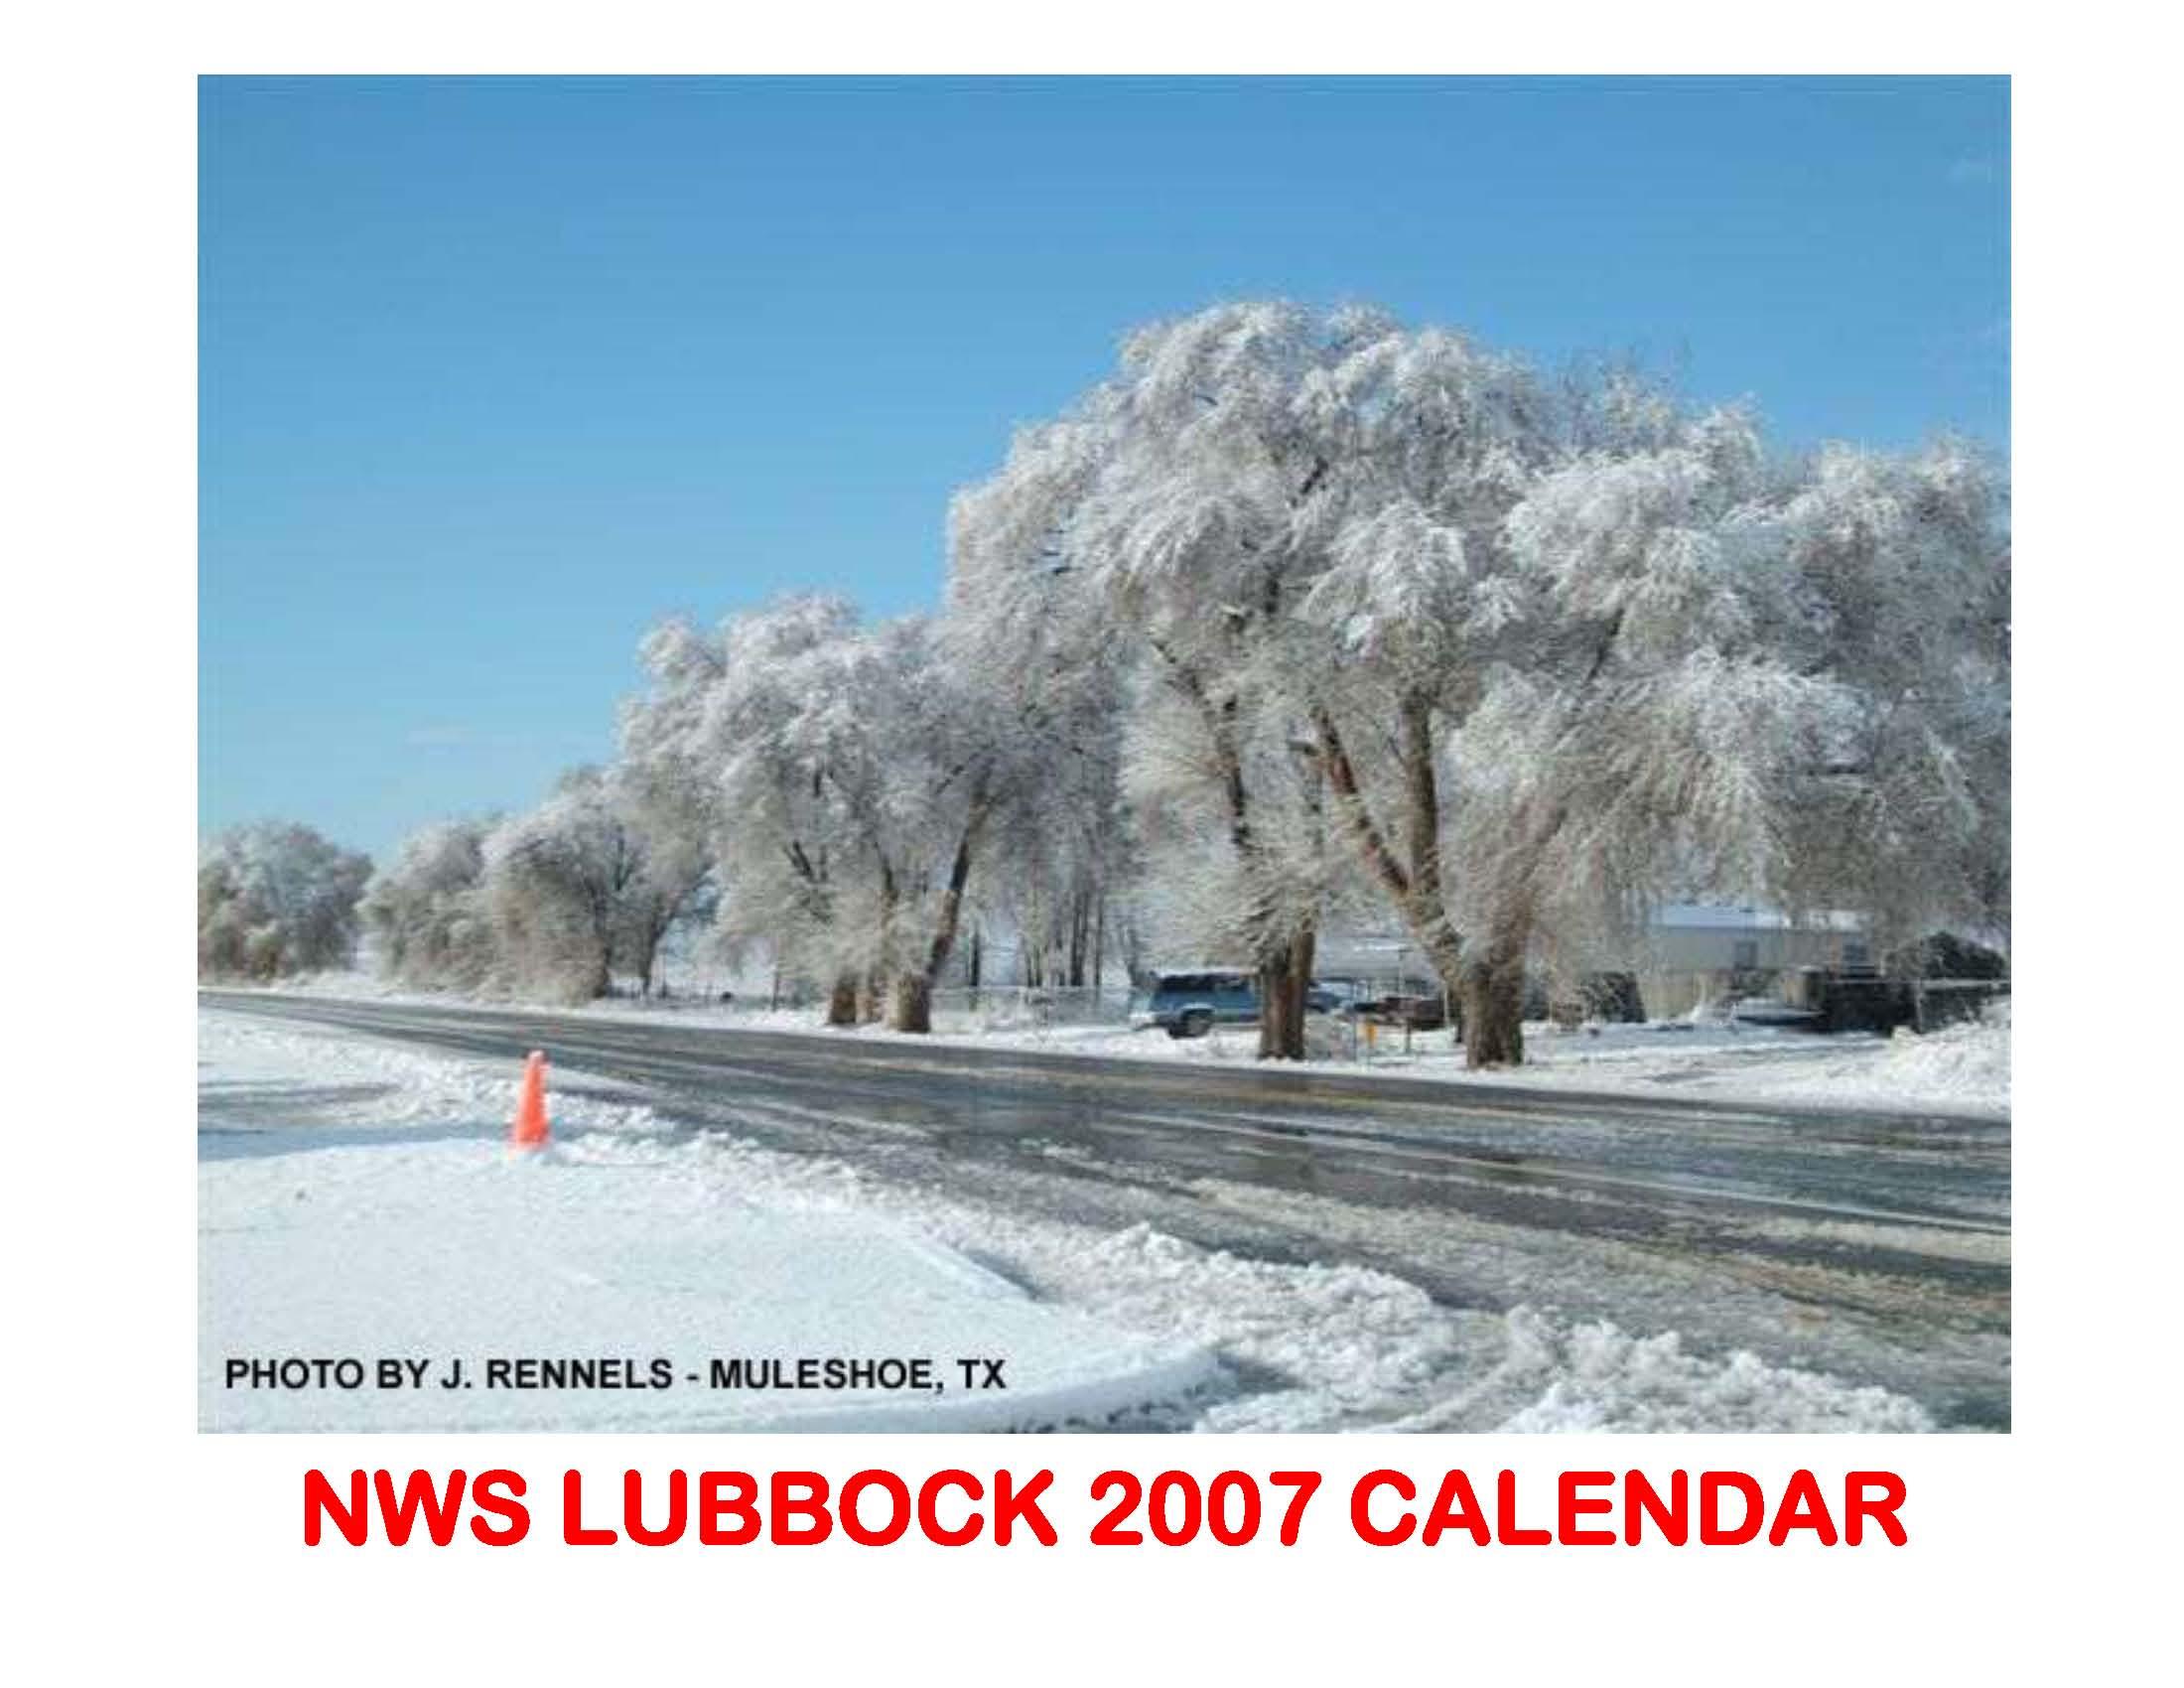 2007 NWS Lubbock Calendar